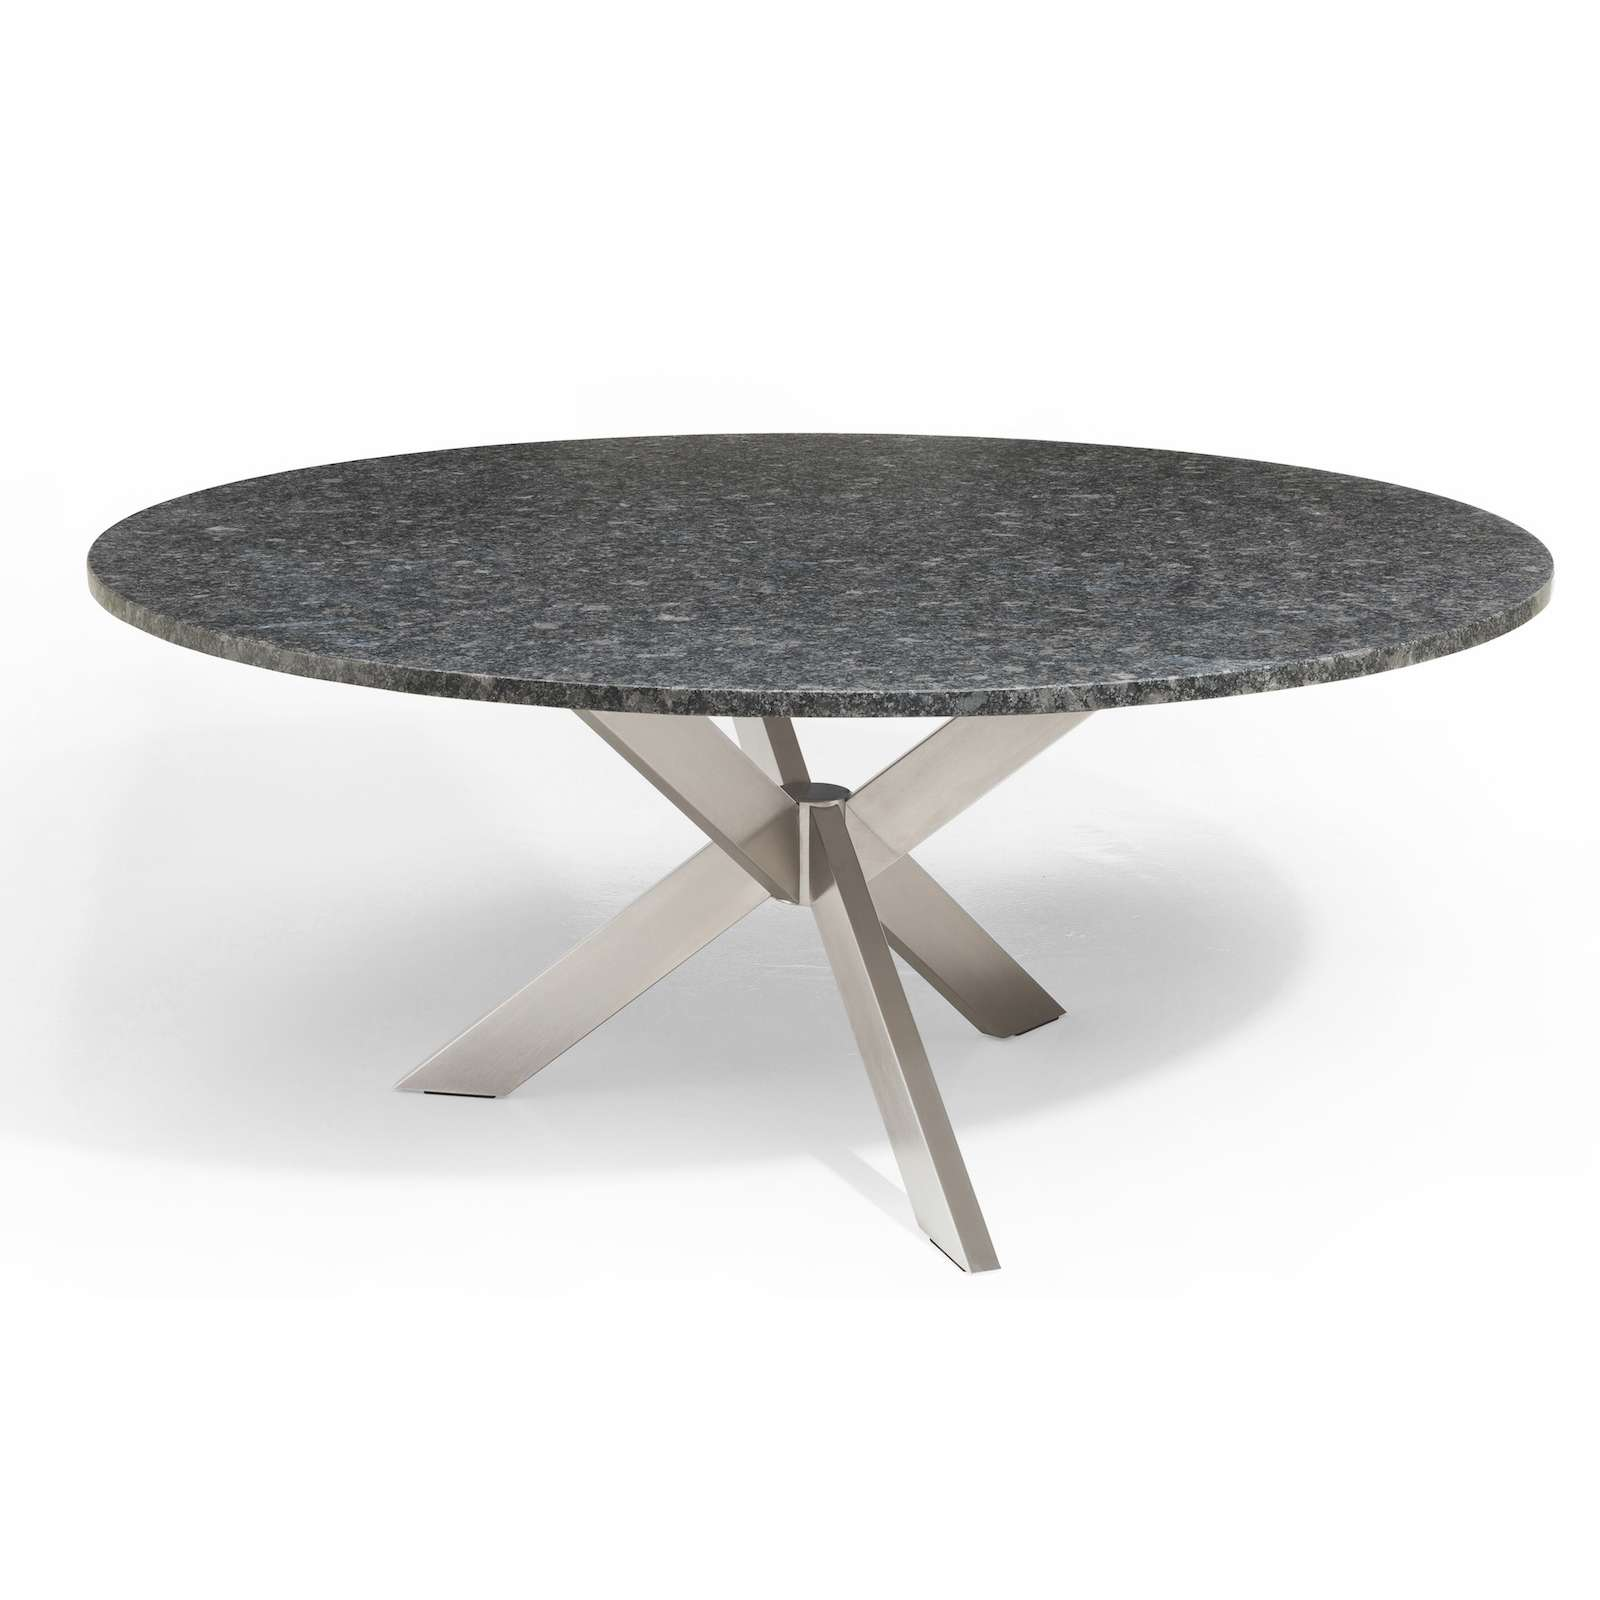 studio 20 havana granittisch rund 140 cm edelstahl gartentisch granitplatte. Black Bedroom Furniture Sets. Home Design Ideas